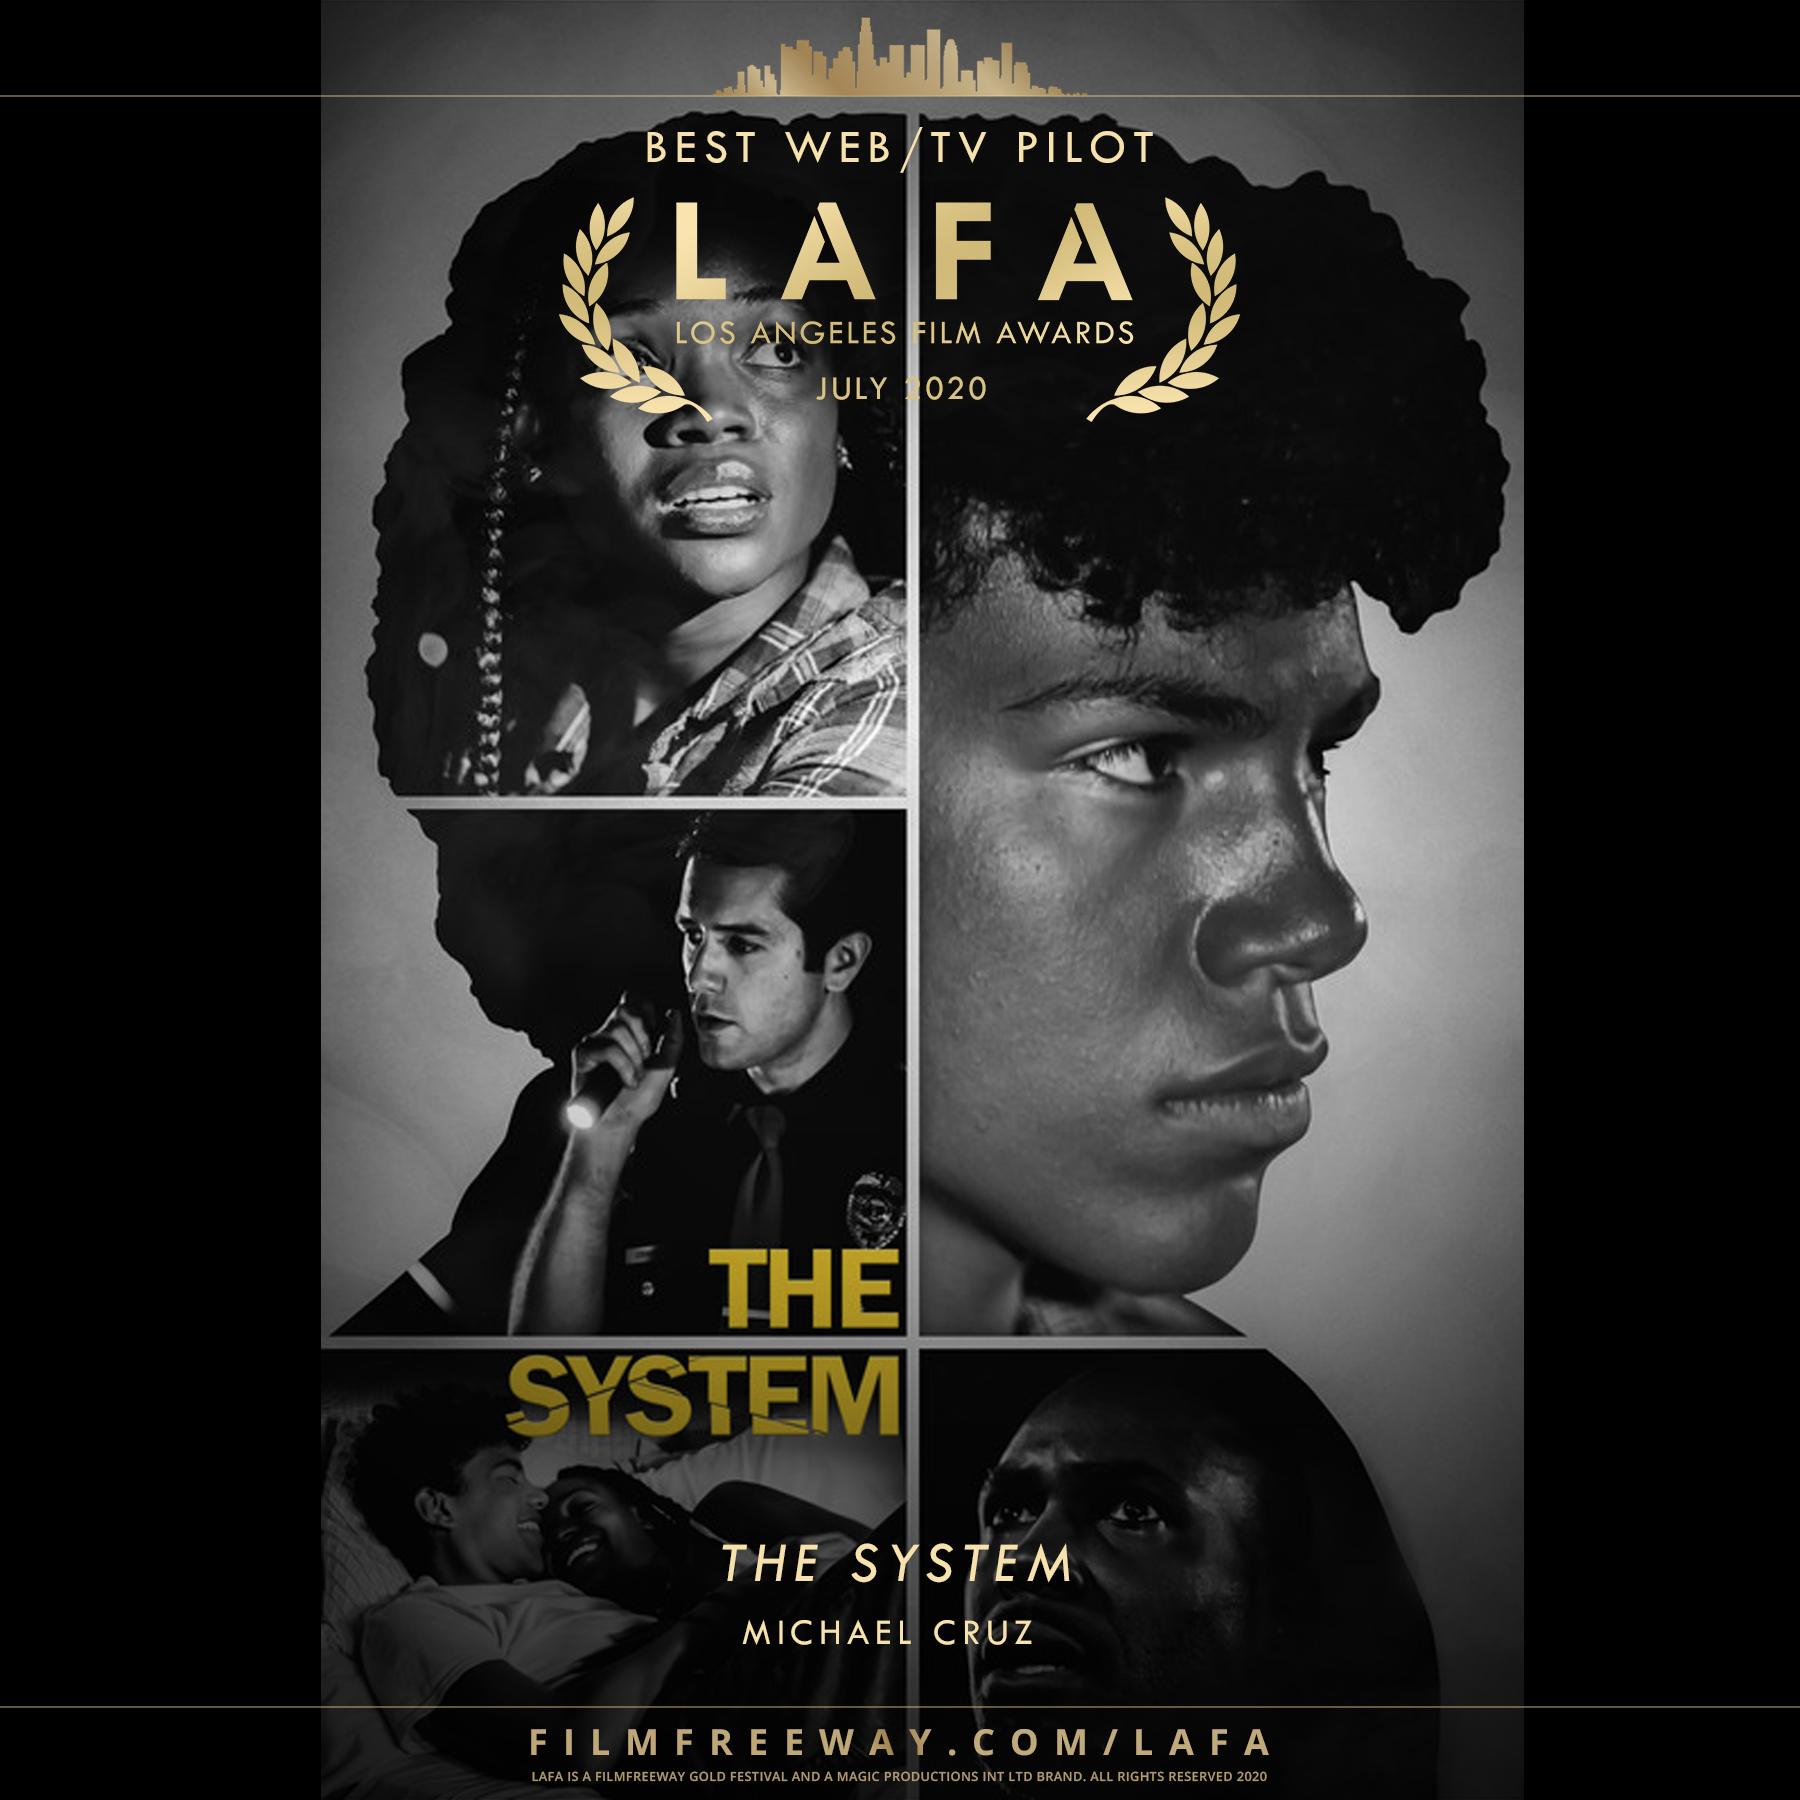 The System design